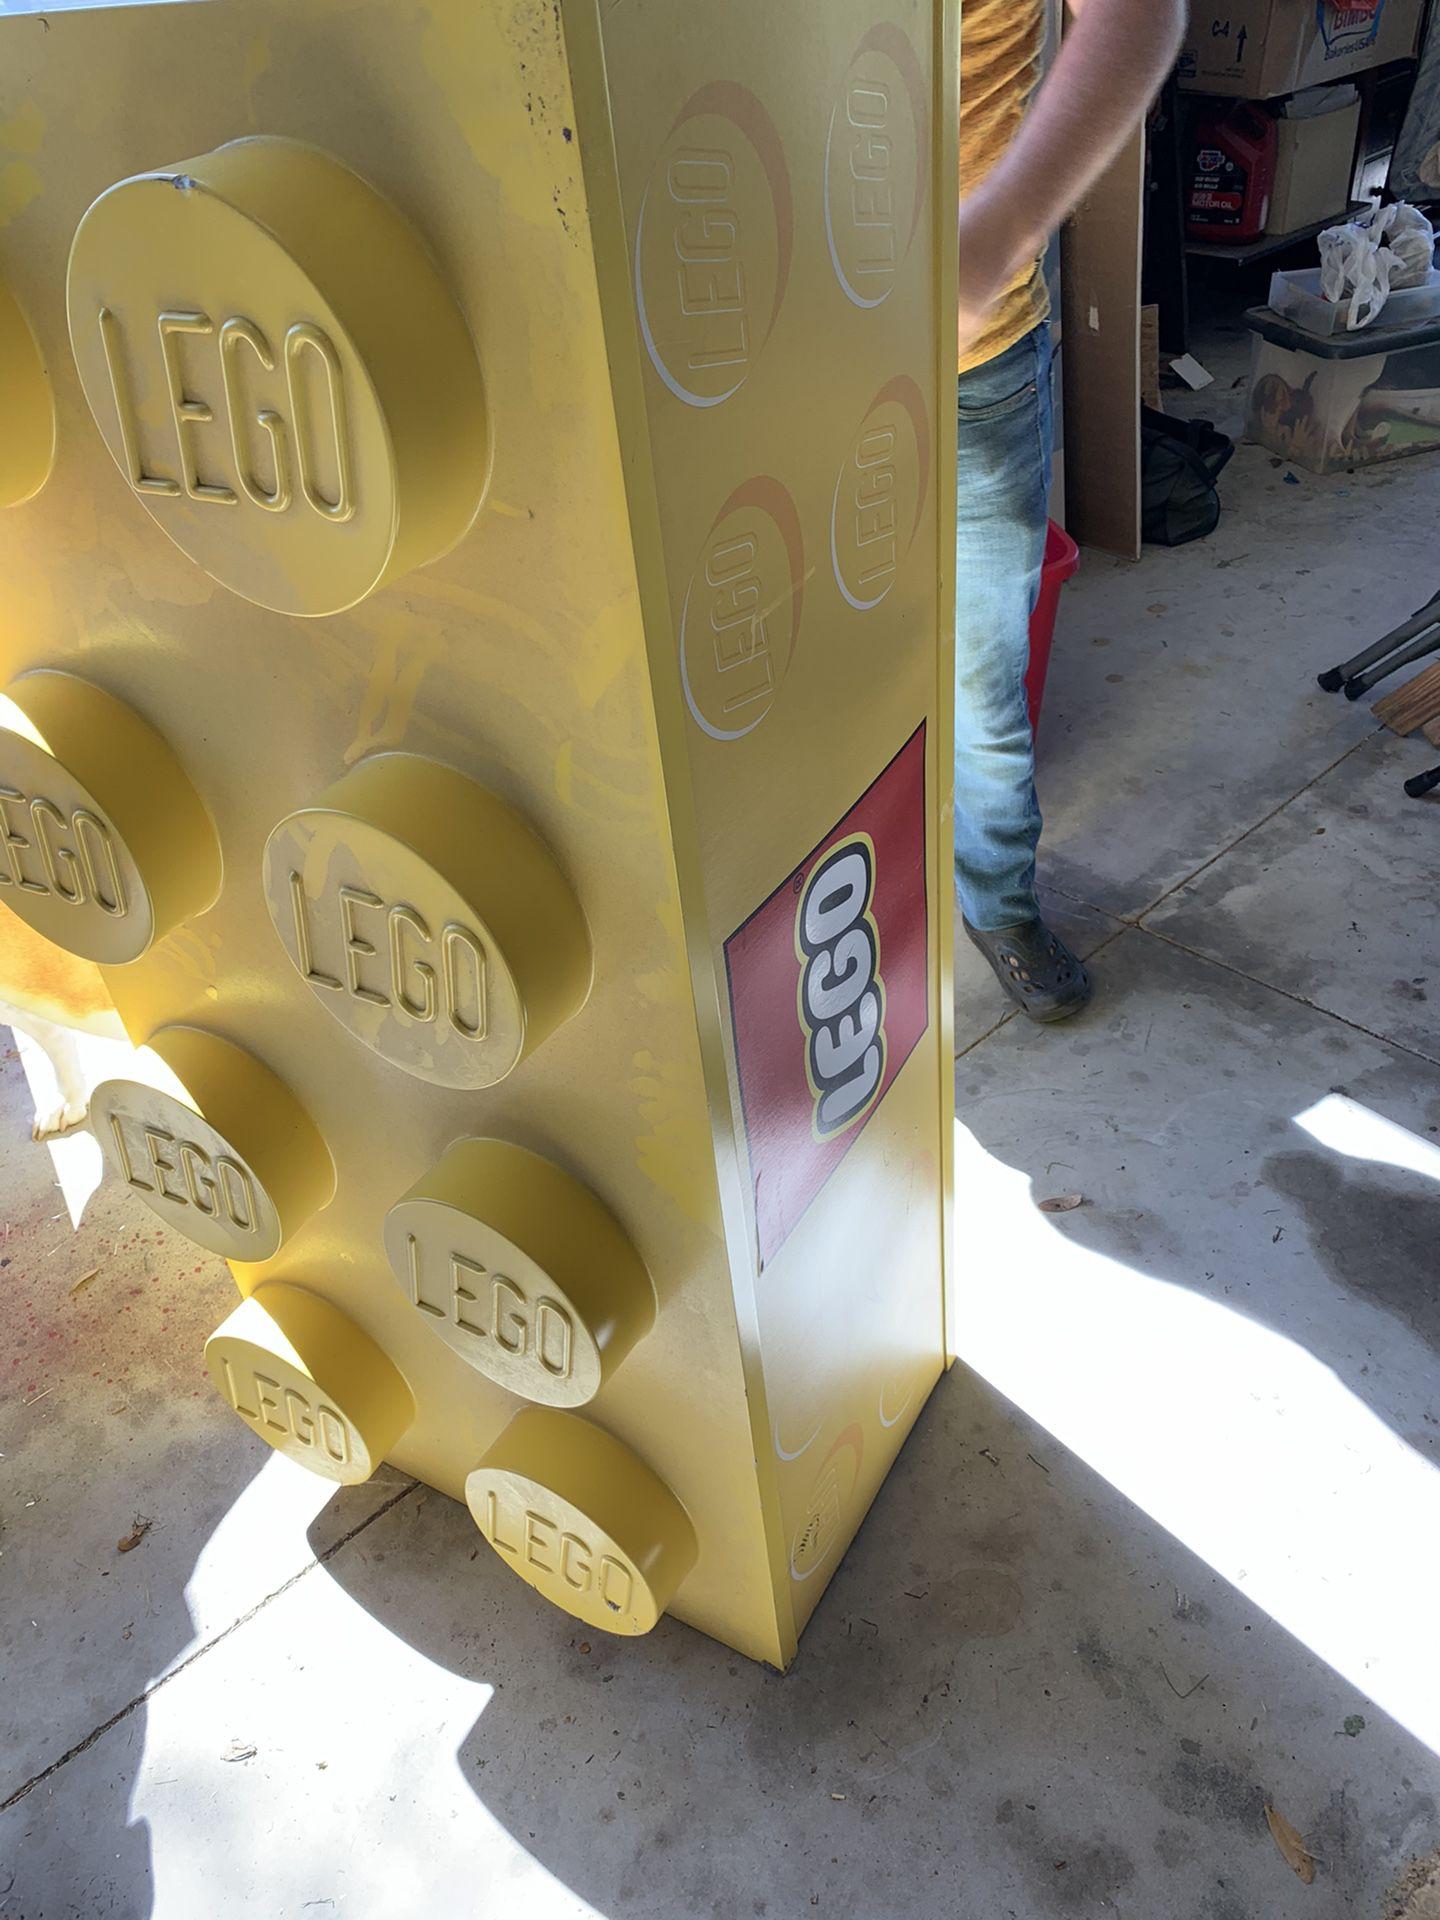 Leggo Display